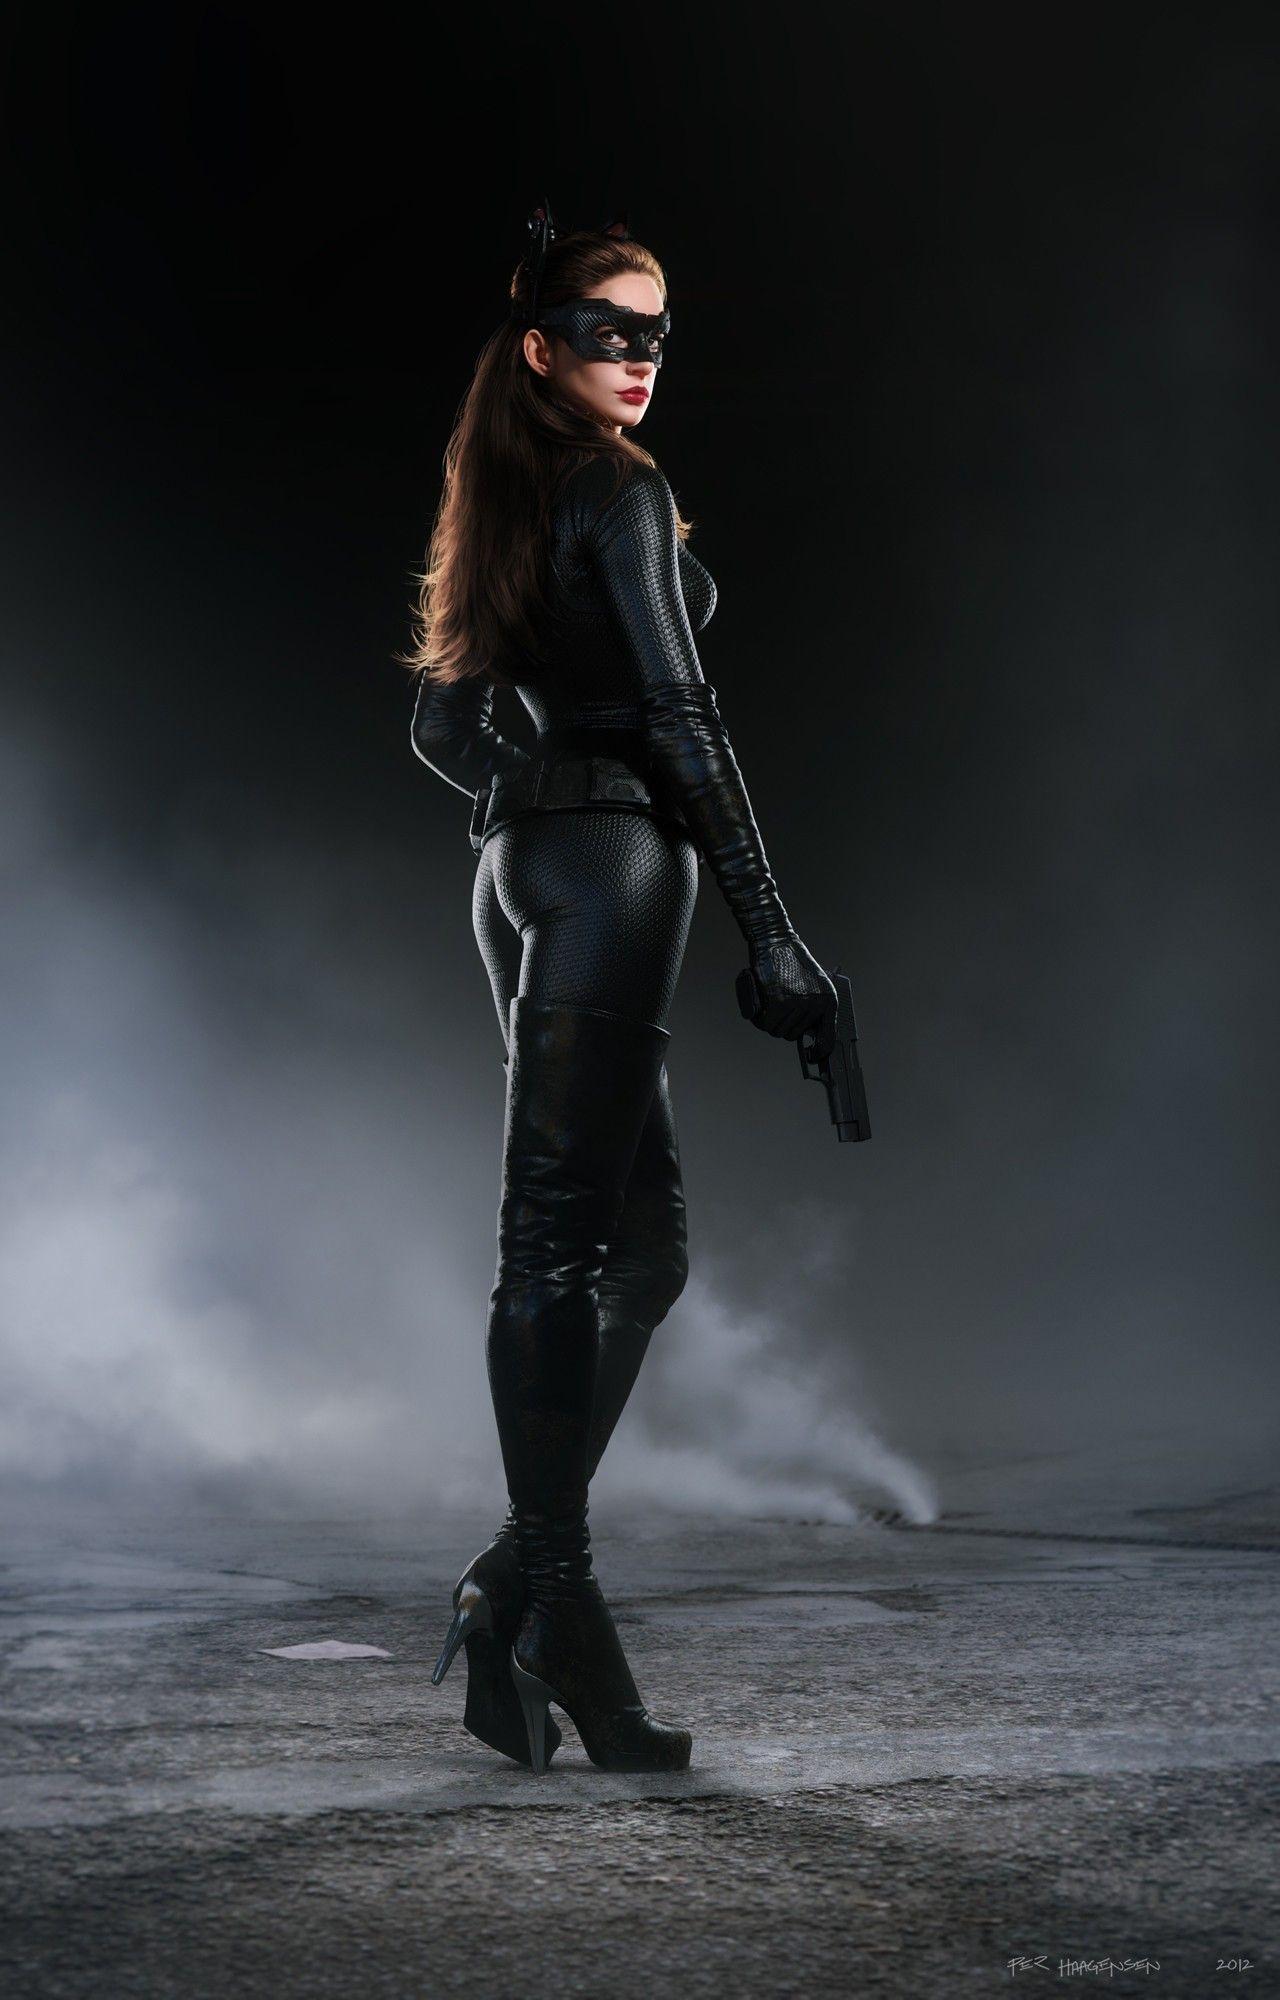 Anne hathaway batman